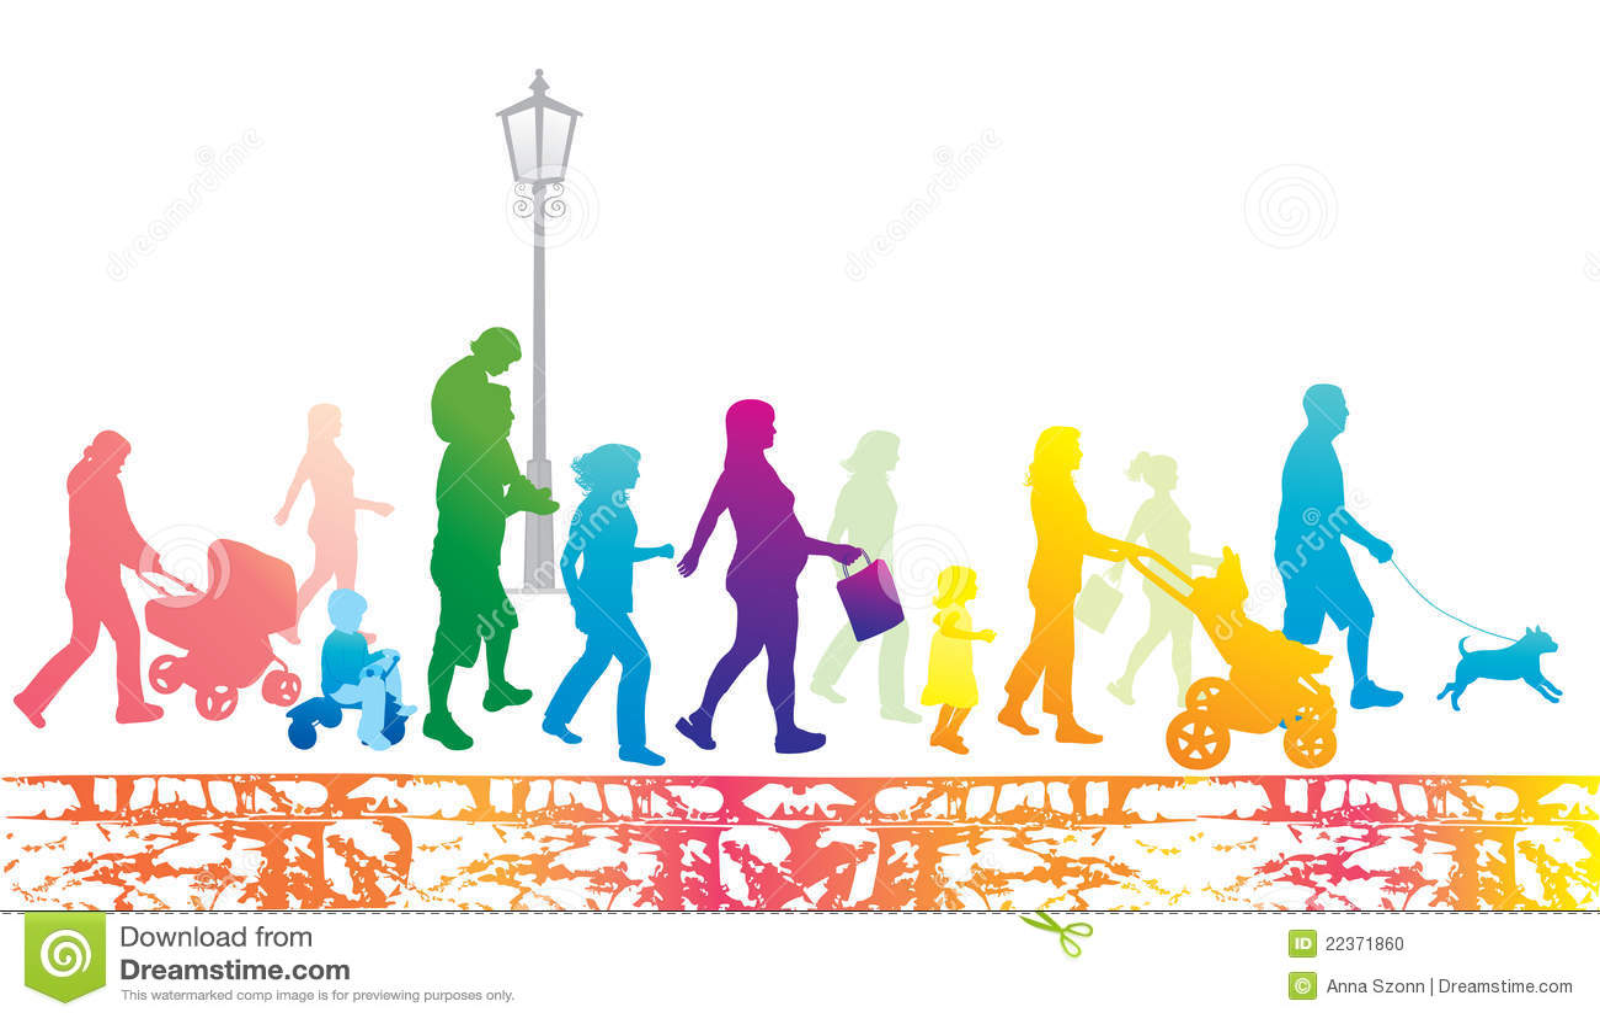 Lifestyle In The City. Walking People.Urban Scene. Stock ...